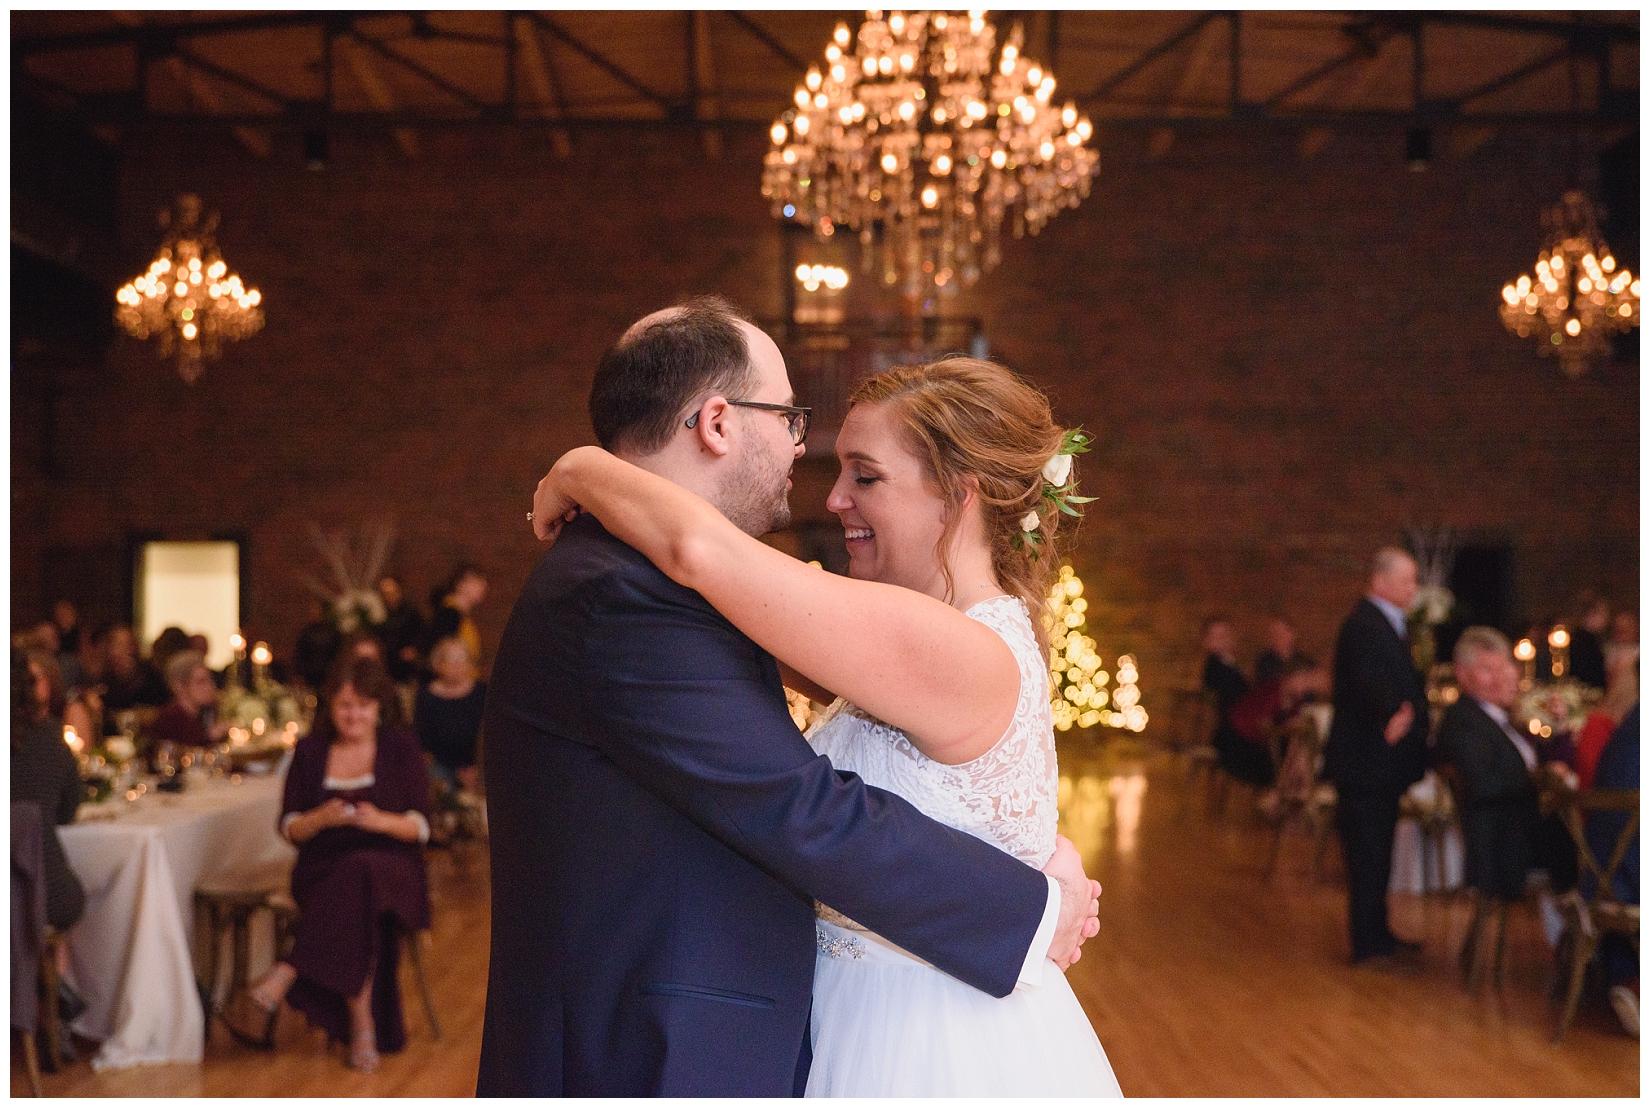 cat-alkire-wedding-photographer-indiana-chicago-indianapolis-fort-wayne_1001.jpg